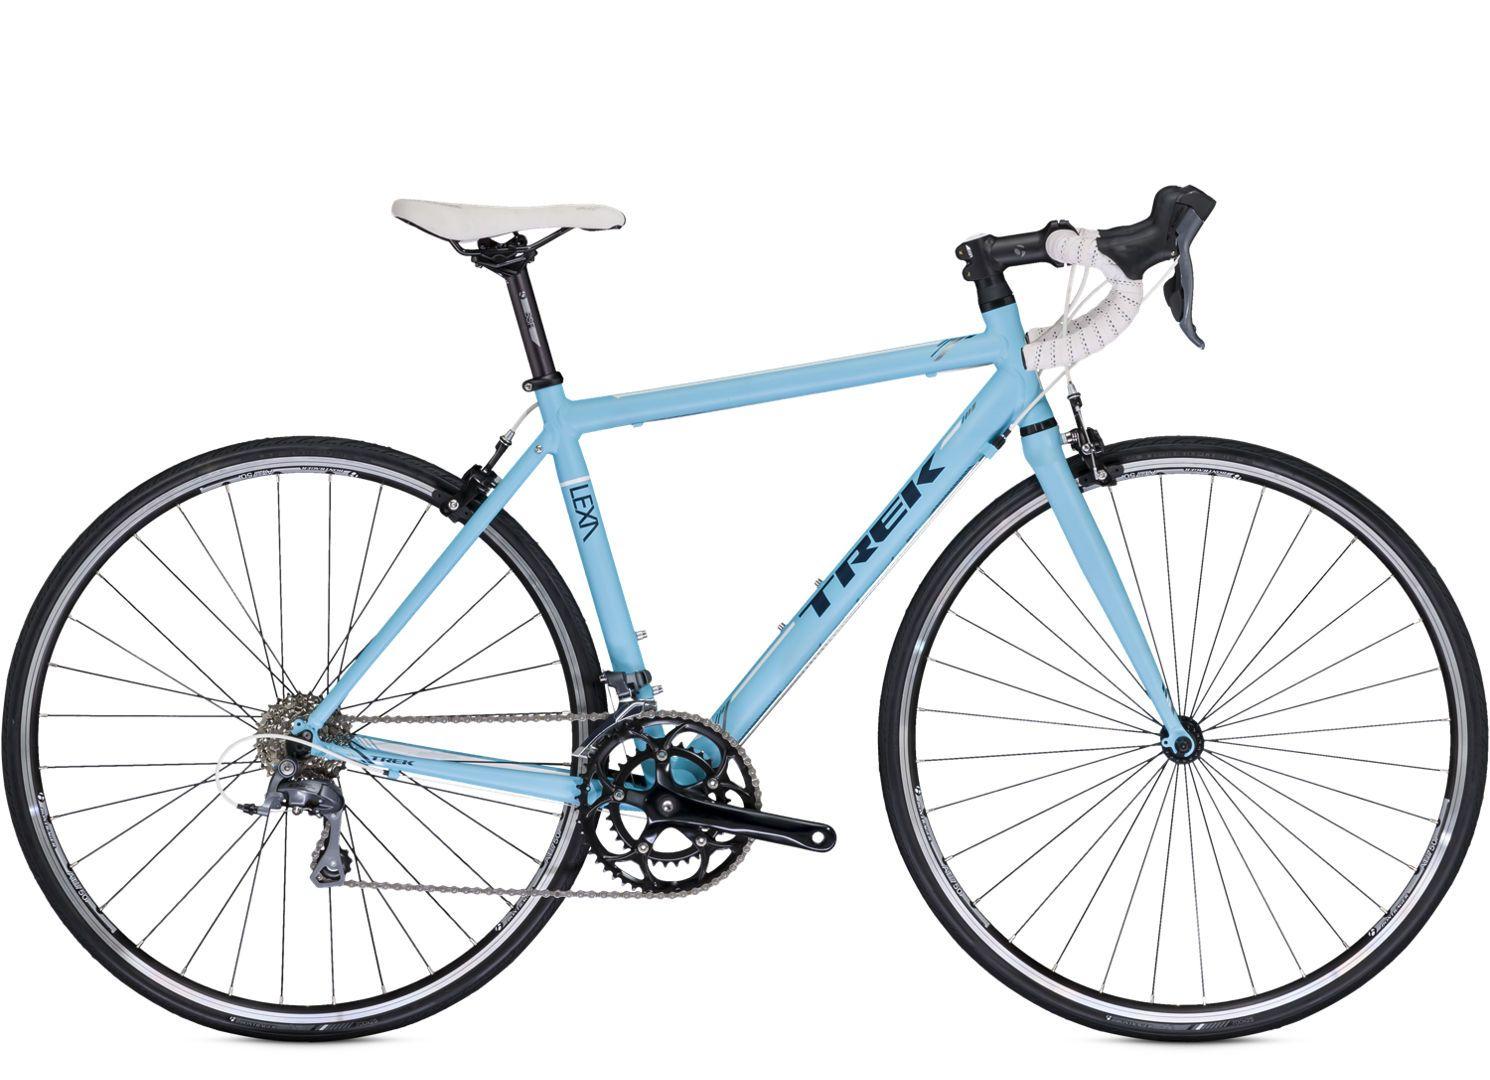 Lexa New Trek Bicycle Road Bikes Trek Bicycle Road Bike